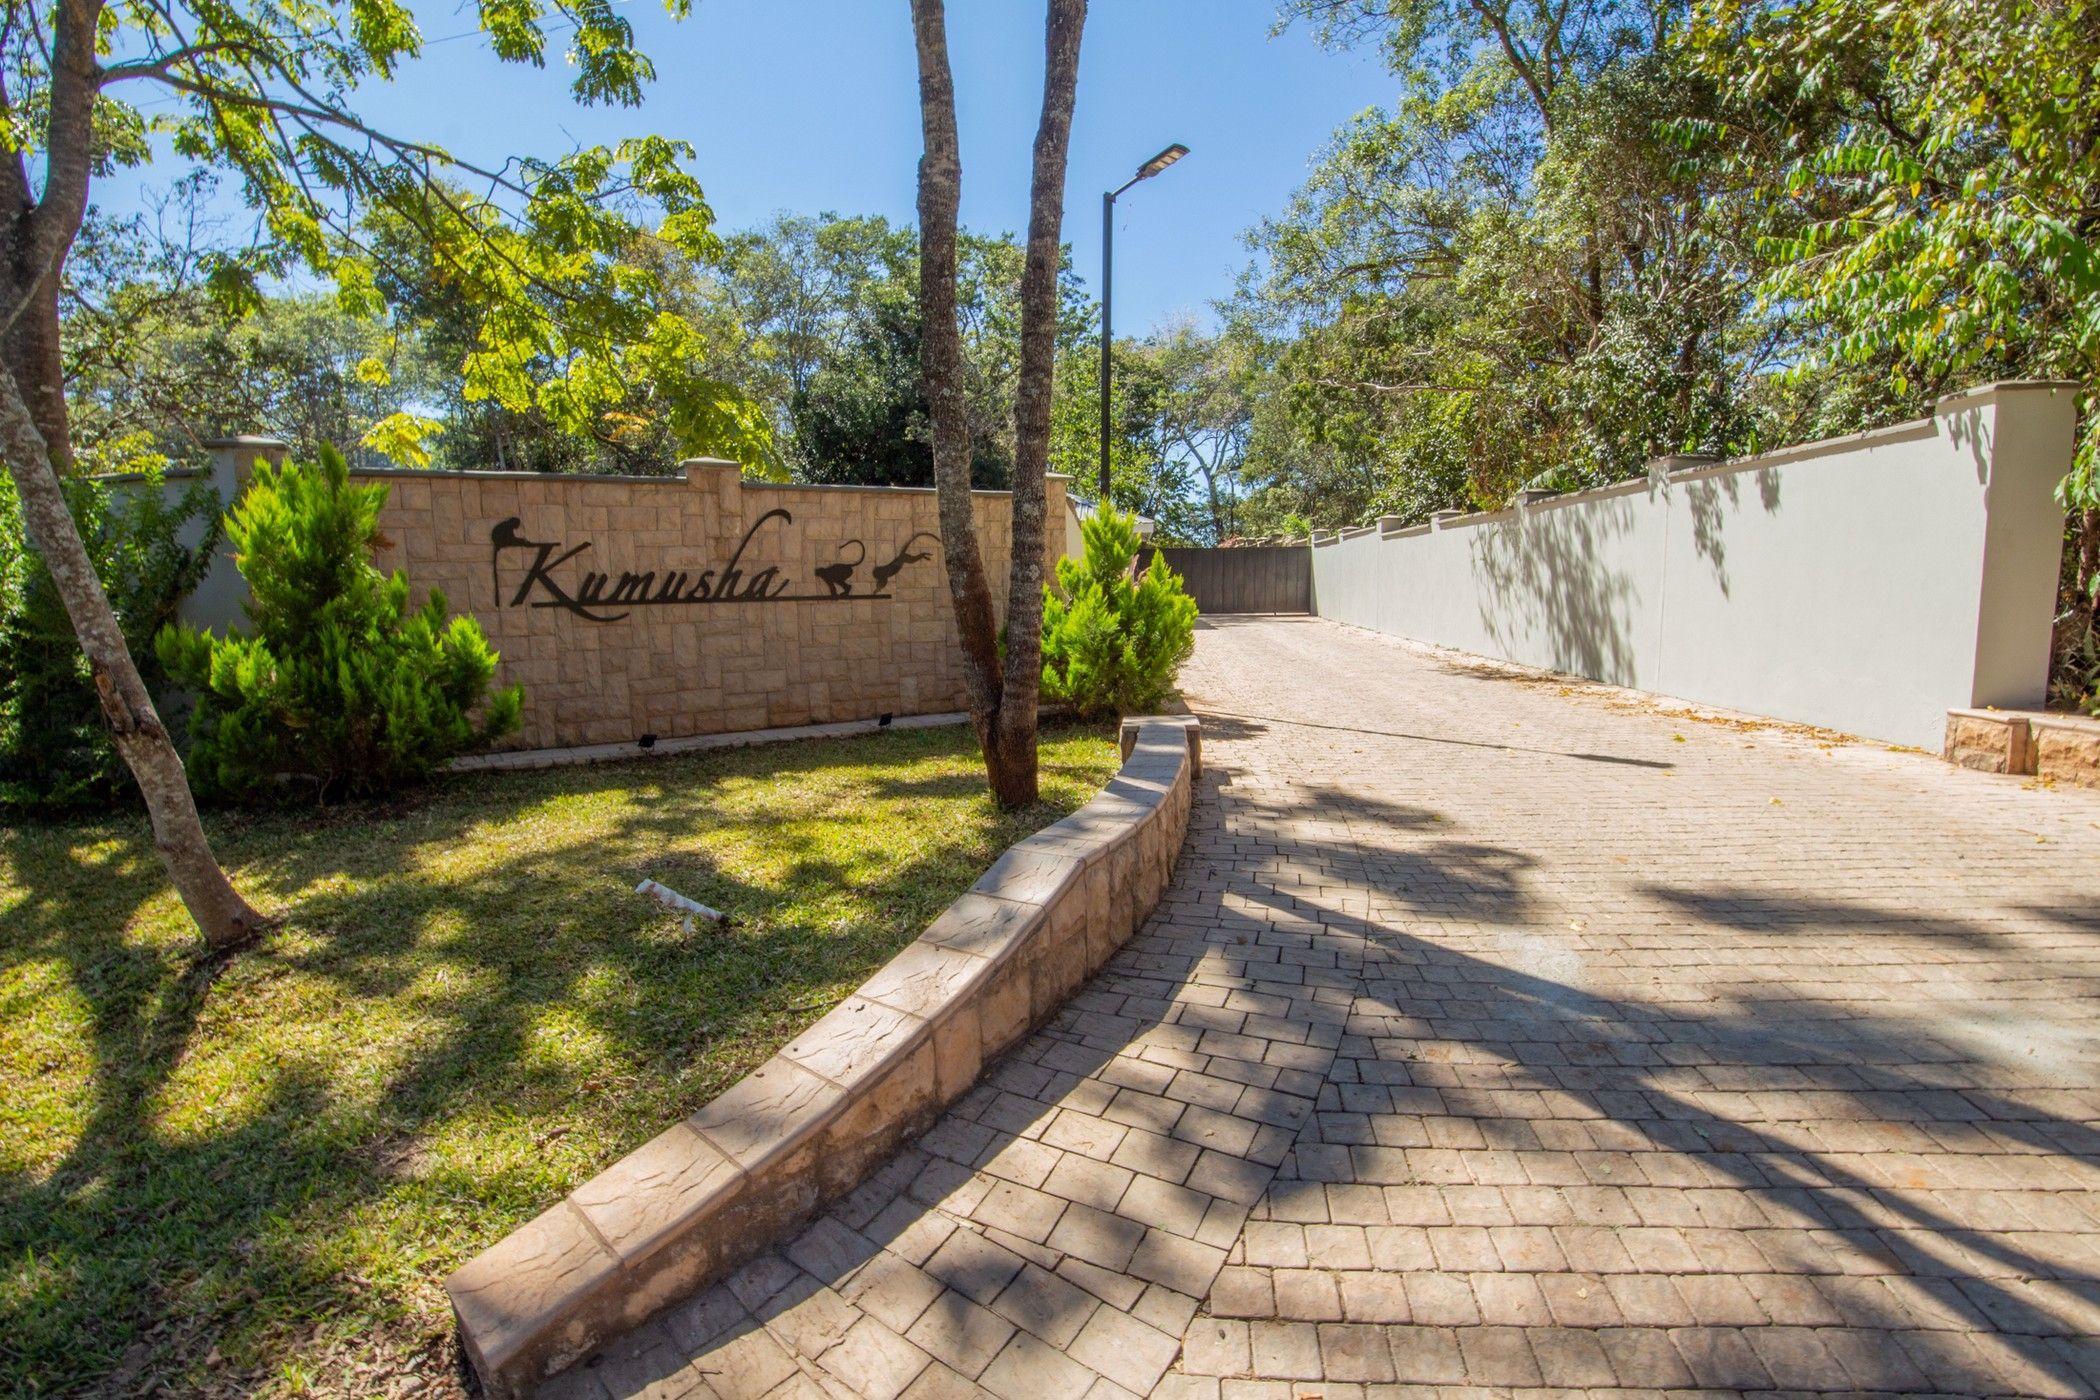 3 bedroom townhouse for sale in Umwinsidale (Zimbabwe)